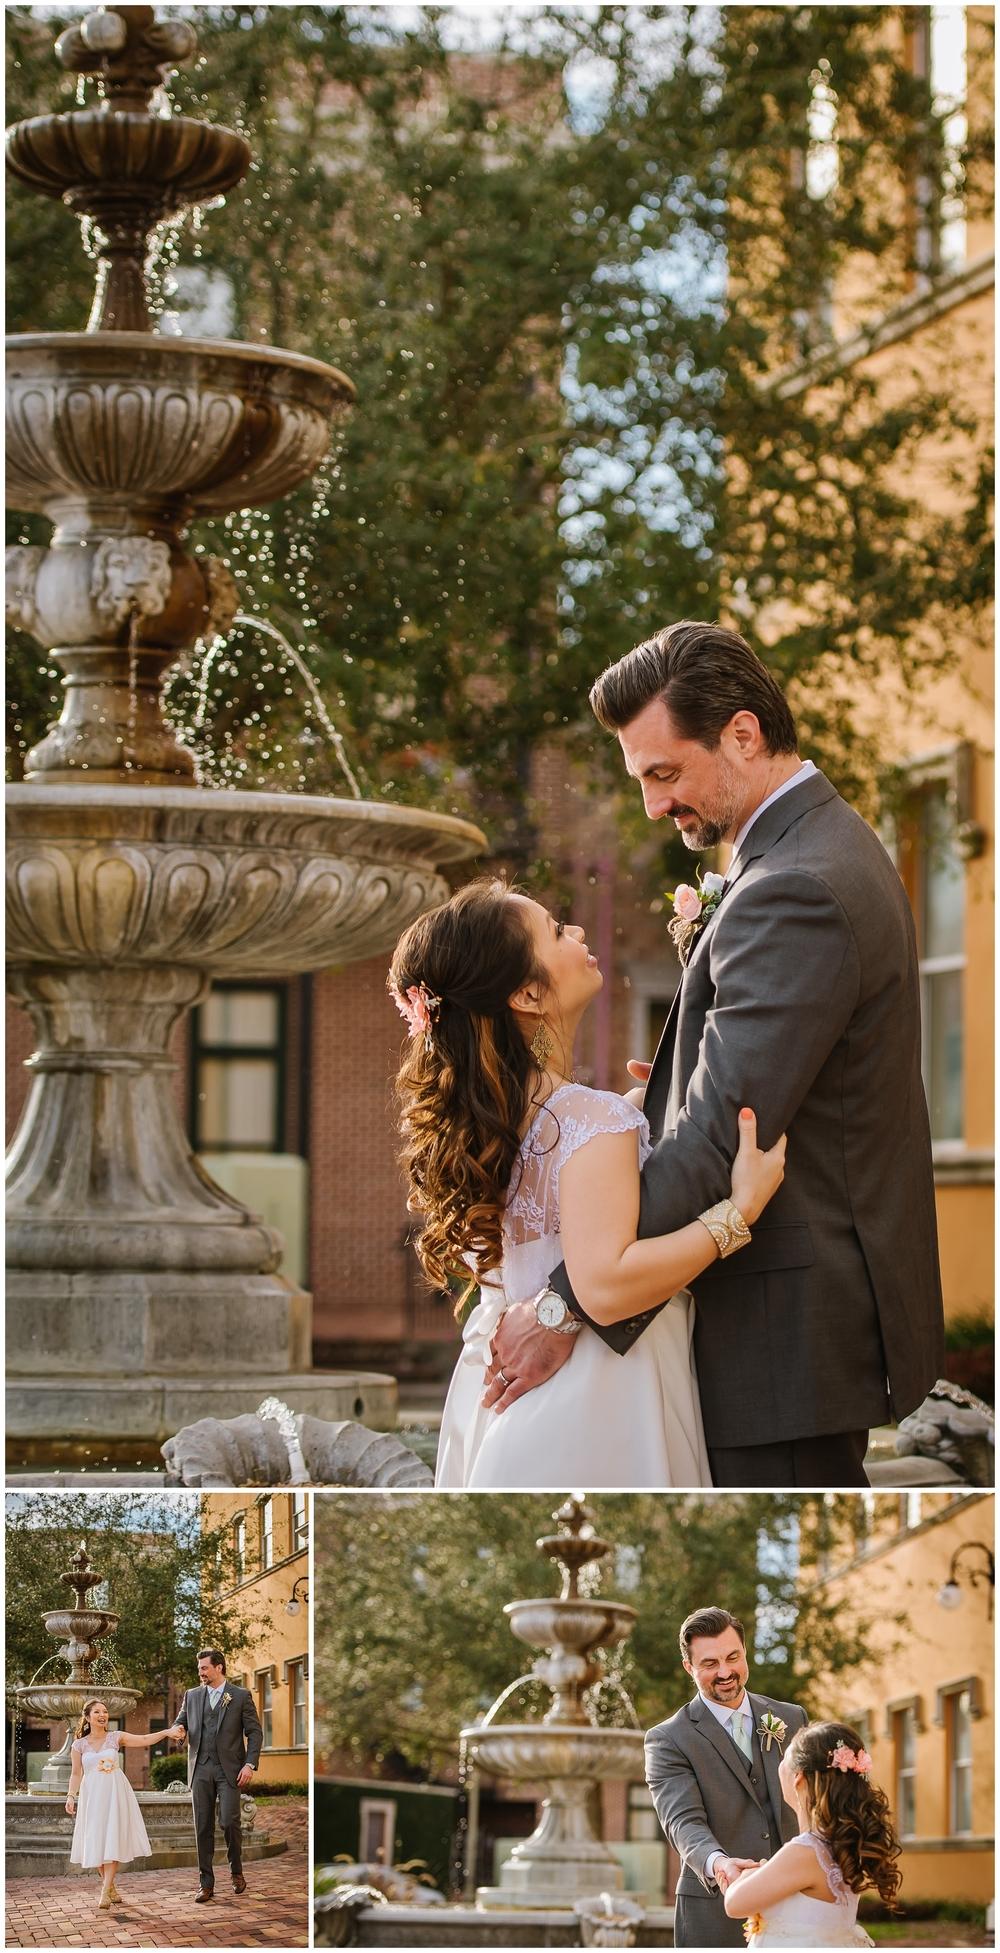 tampa-wedding-photographer-winthrop-barn-ivy-wall-portraits_0169.jpg